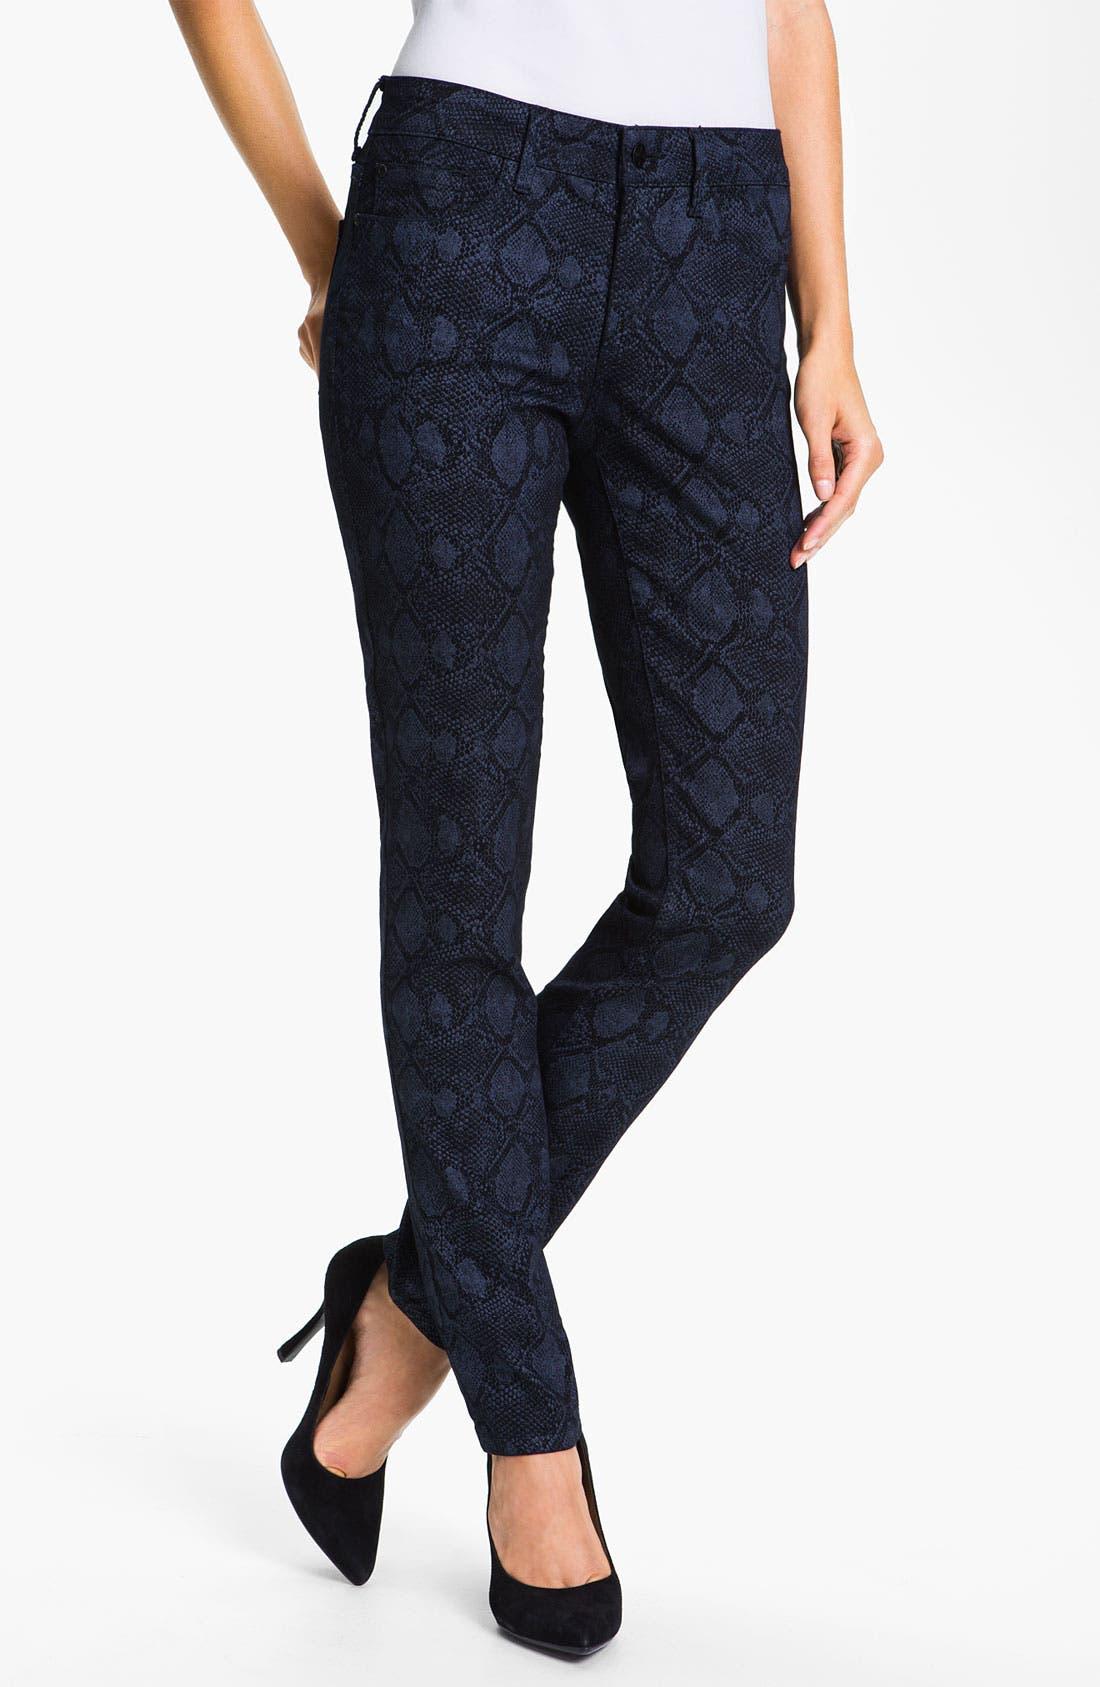 Main Image - NYDJ 'Sheri' Print Stretch Skinny Jeans (Petite)